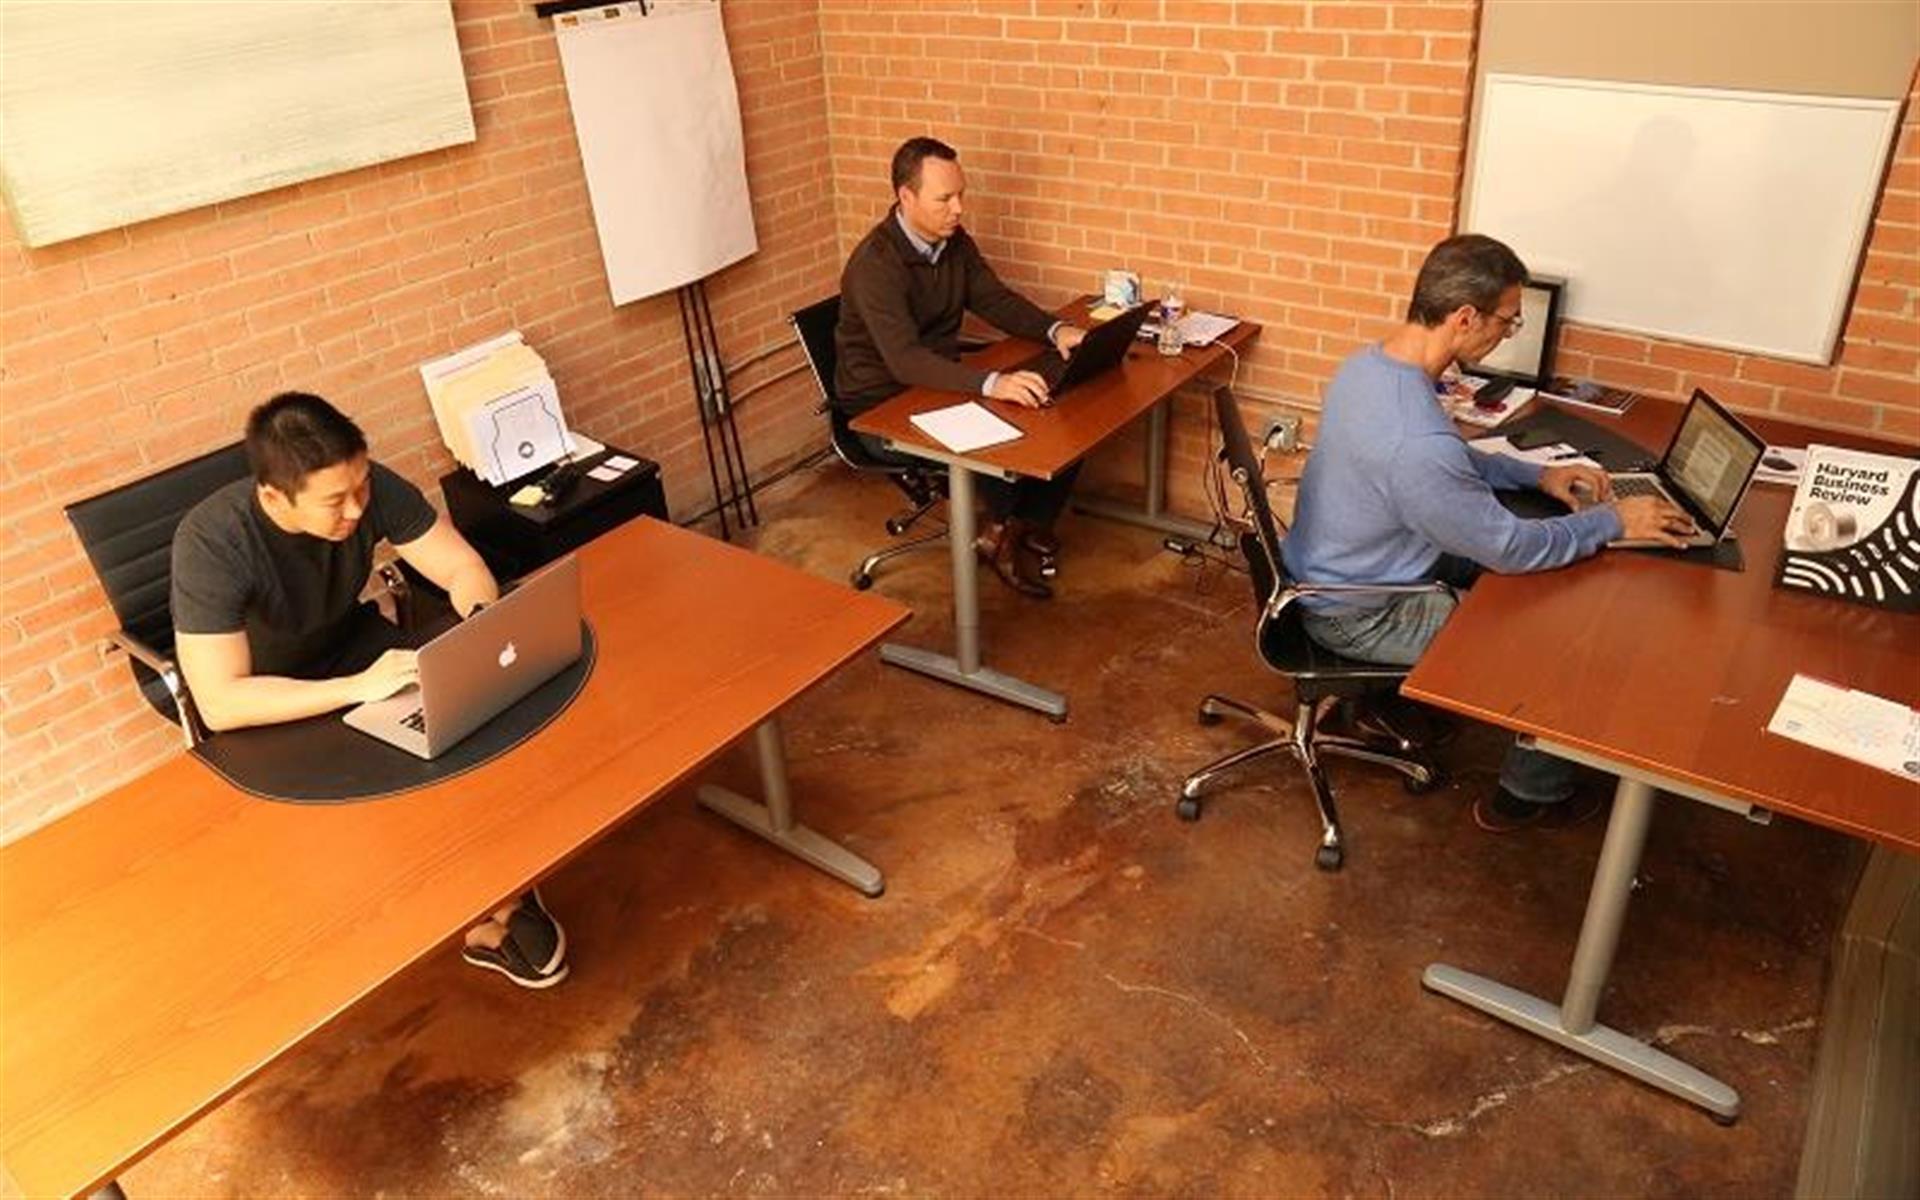 Dallas GeniusDen - Deep Ellum Downtown - Private Office for 4 - GeniusDen